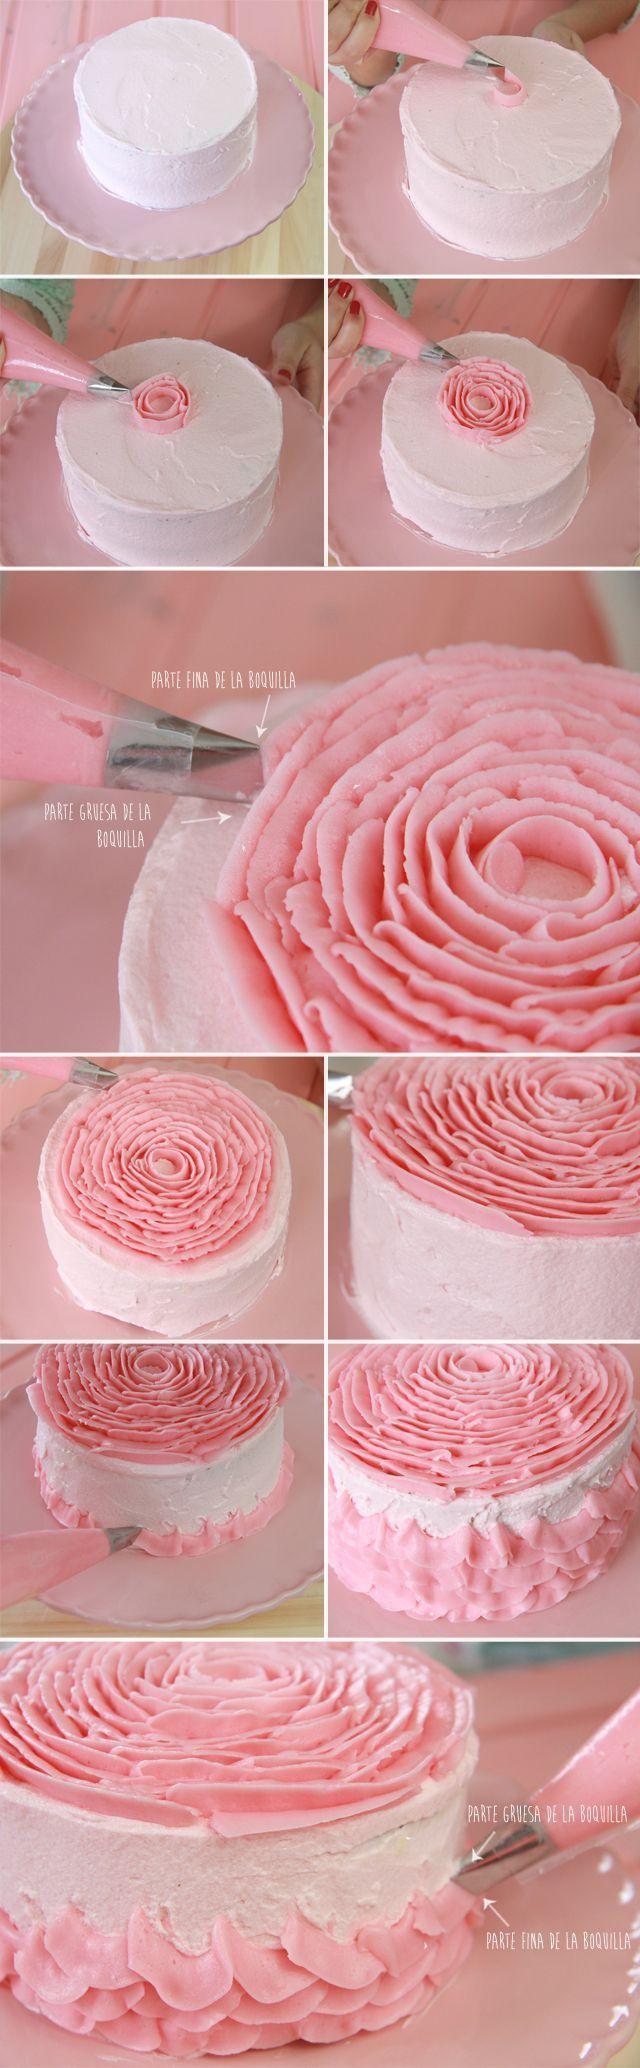 Tutorial Tarta de Rosa - Not in English, but lots of pics - Tip 104: Cake Tutorial, Buttercream Ruffle Cake, Pretty Cake, Buttercream Rose, Buttercream Cake, Rose Cake, Pink Rose